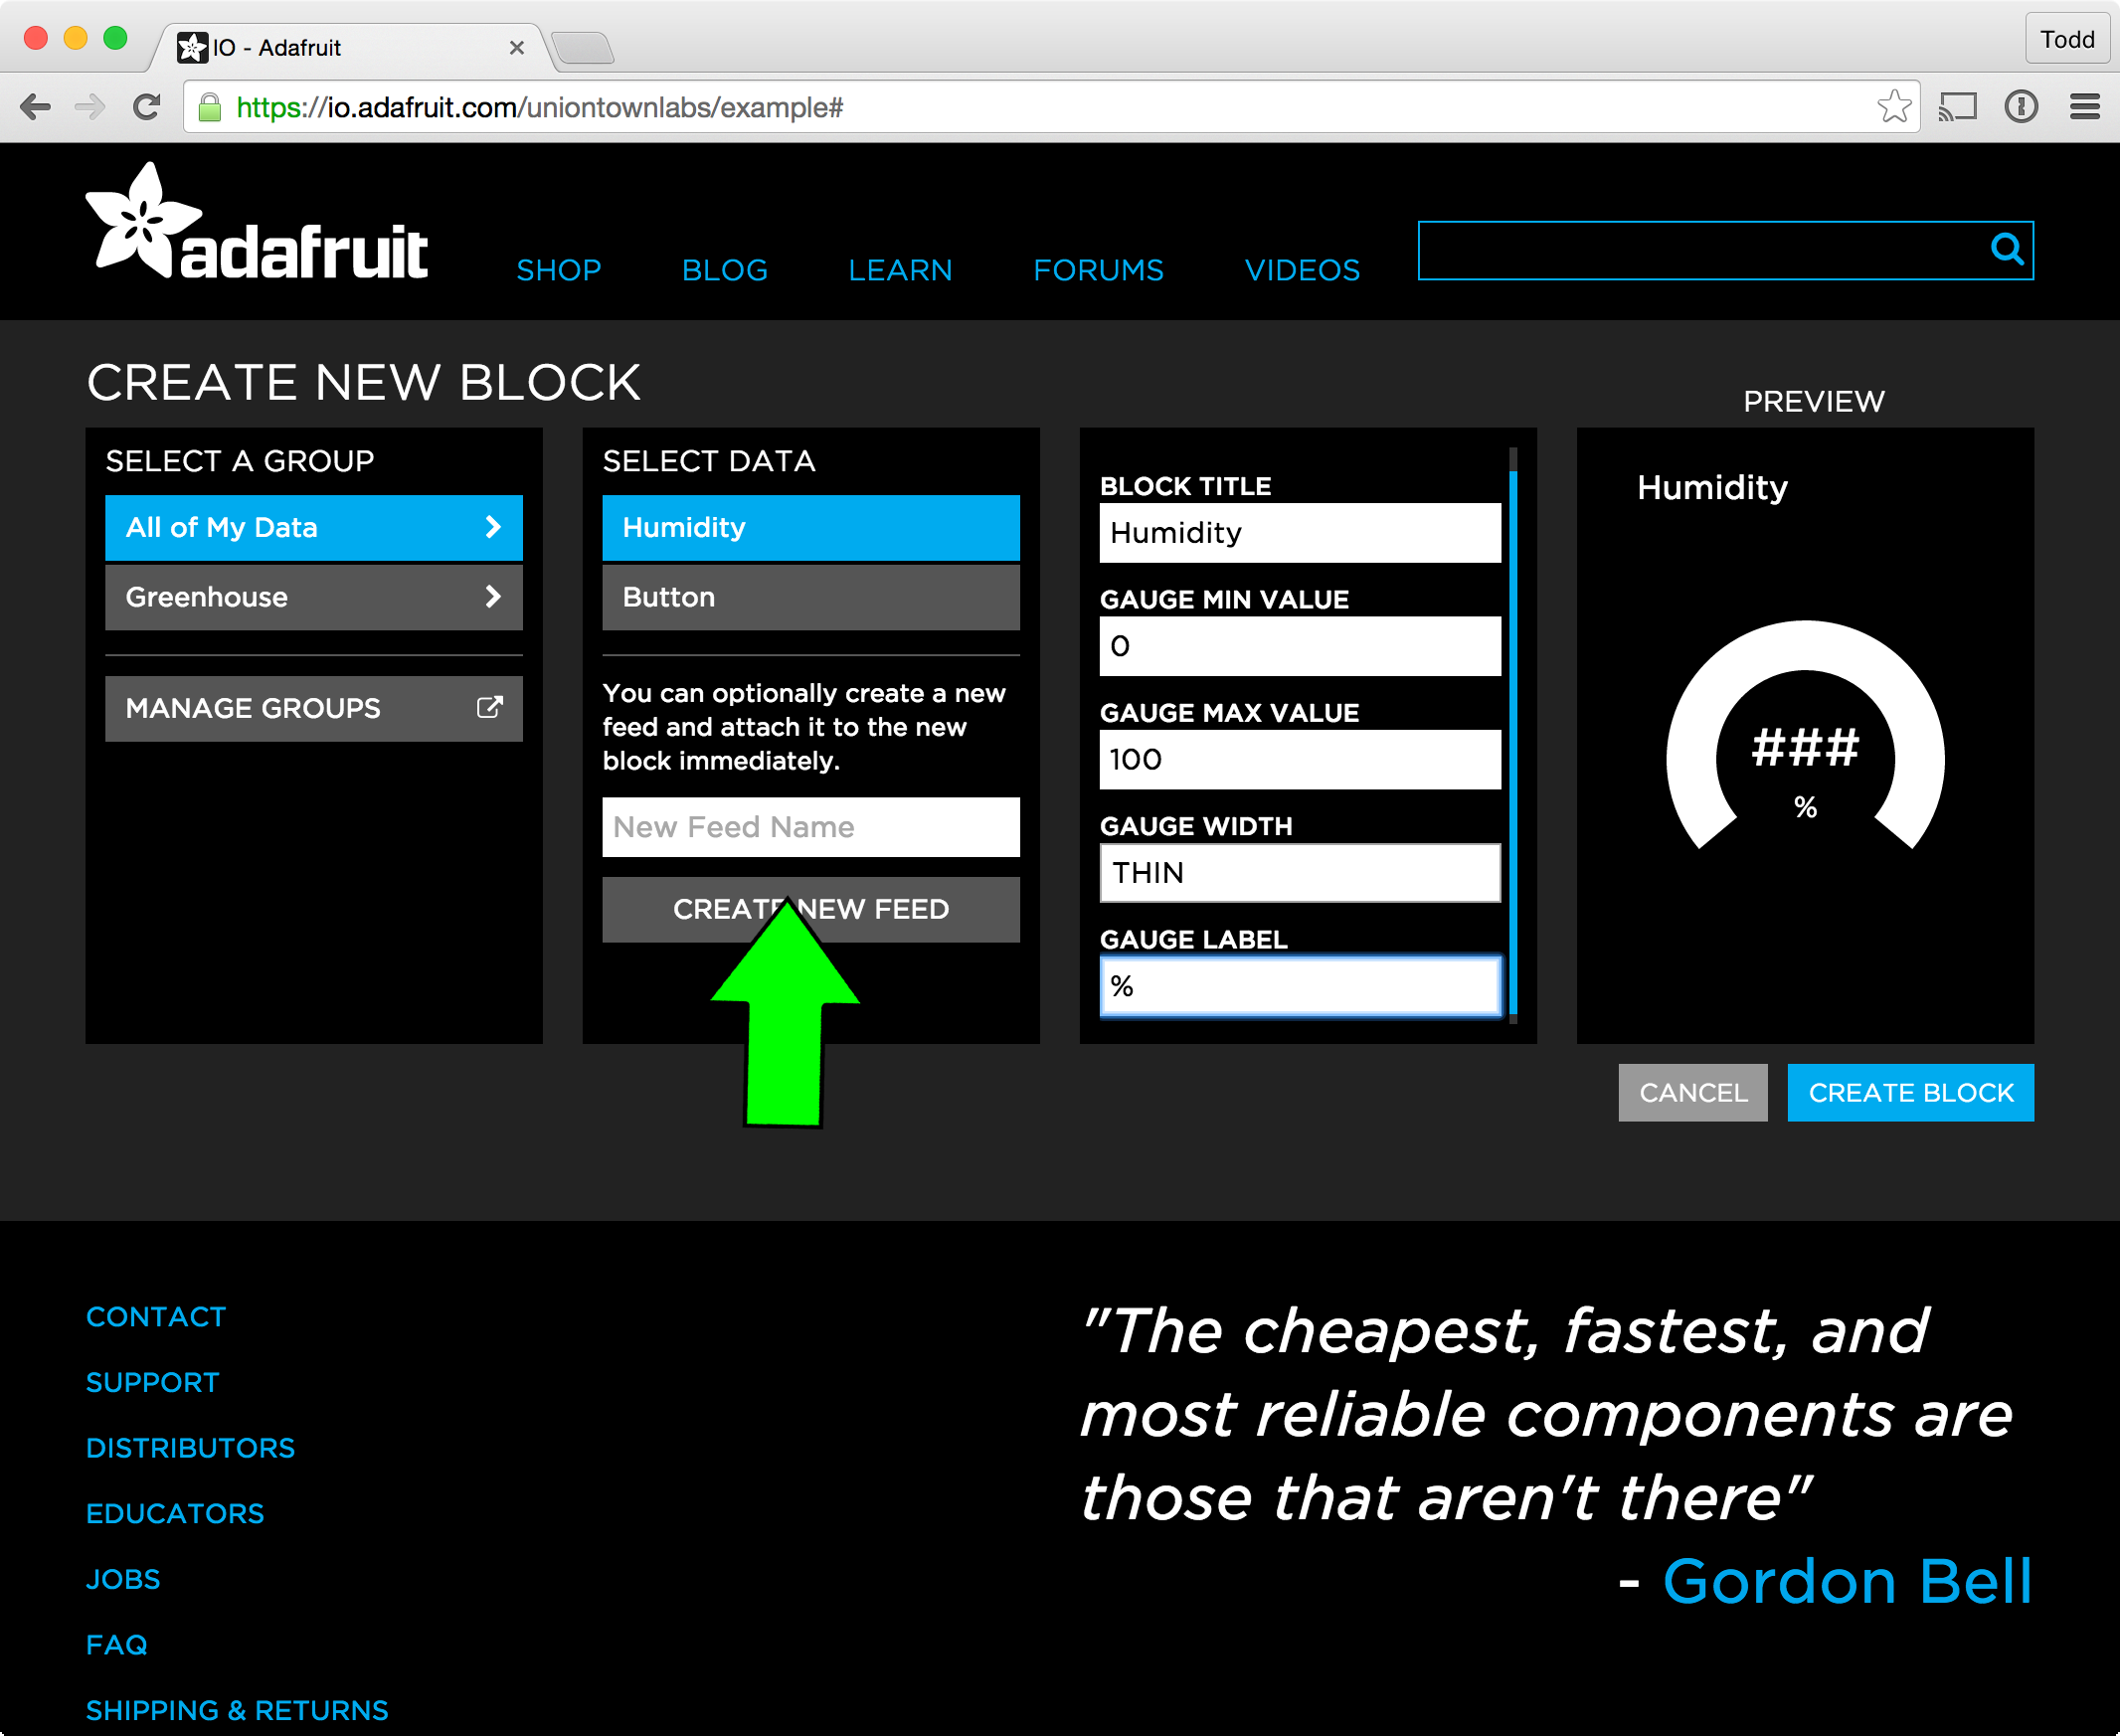 adafruit_io_new_block3.png